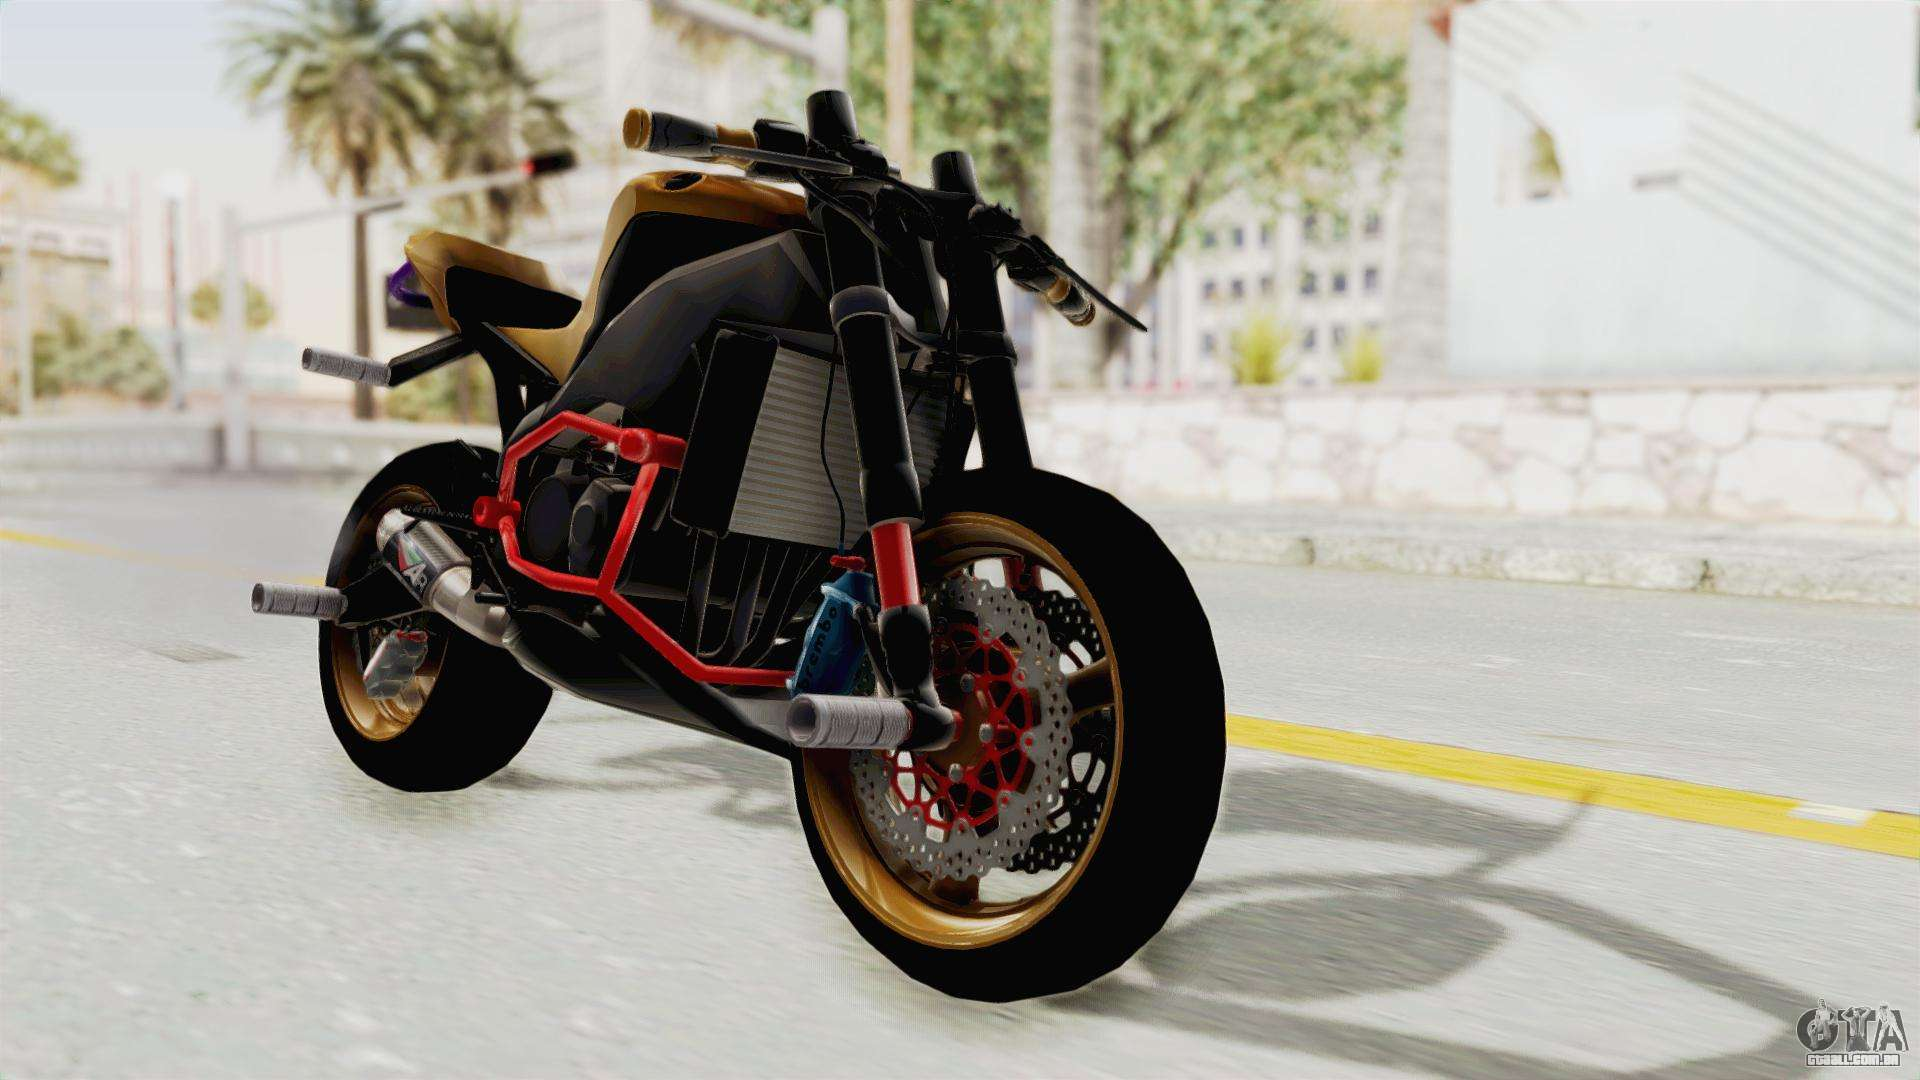 Honda Cbr1000Rr Naked Bike Stunt Para Gta San Andreas-3971